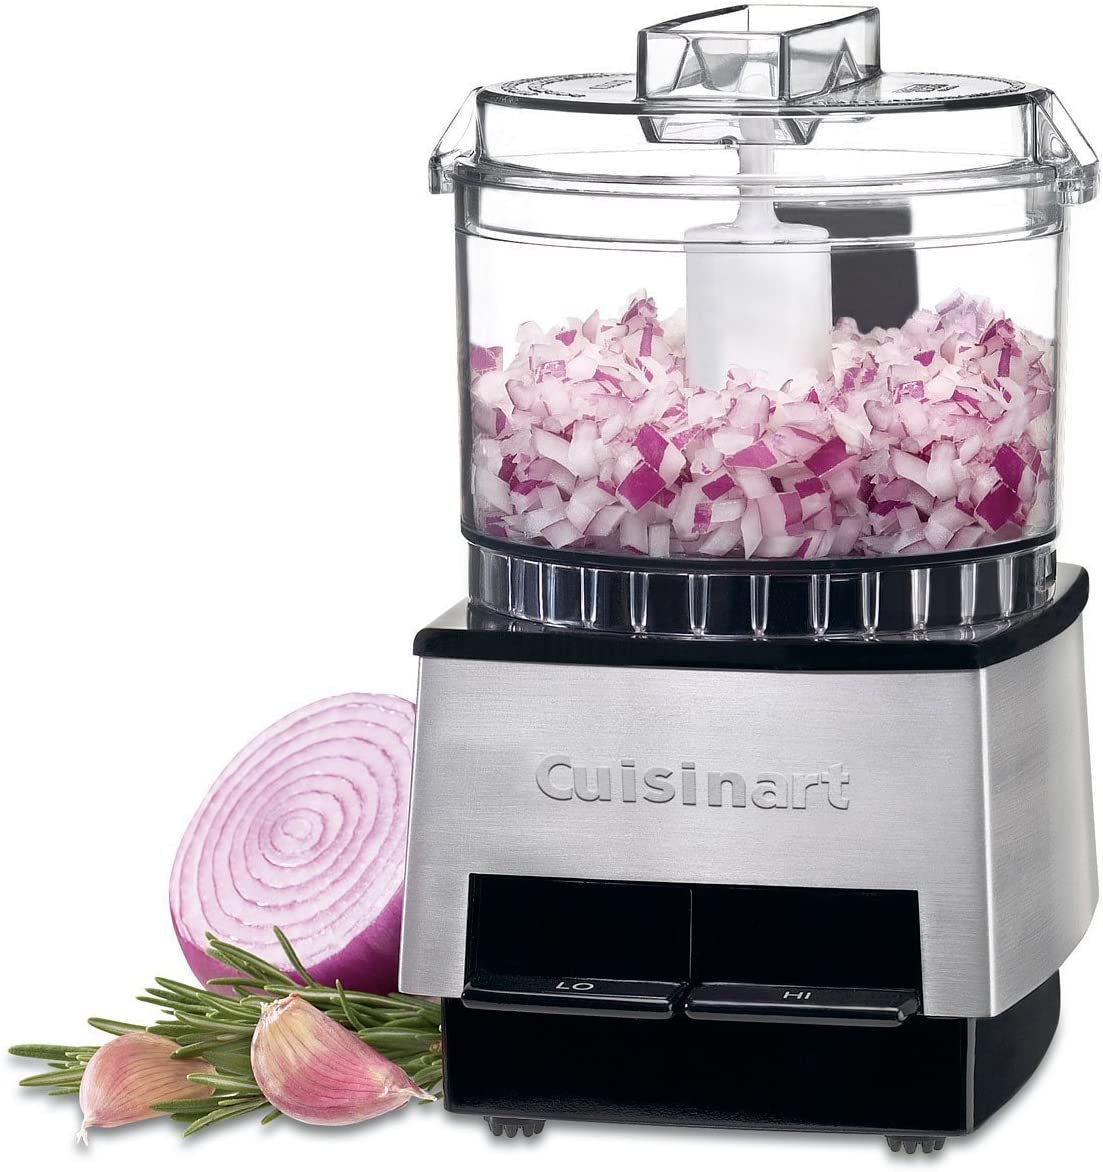 alpha-ene.co.jp Home & Kitchen Food Processors Renewed Cuisinart ...